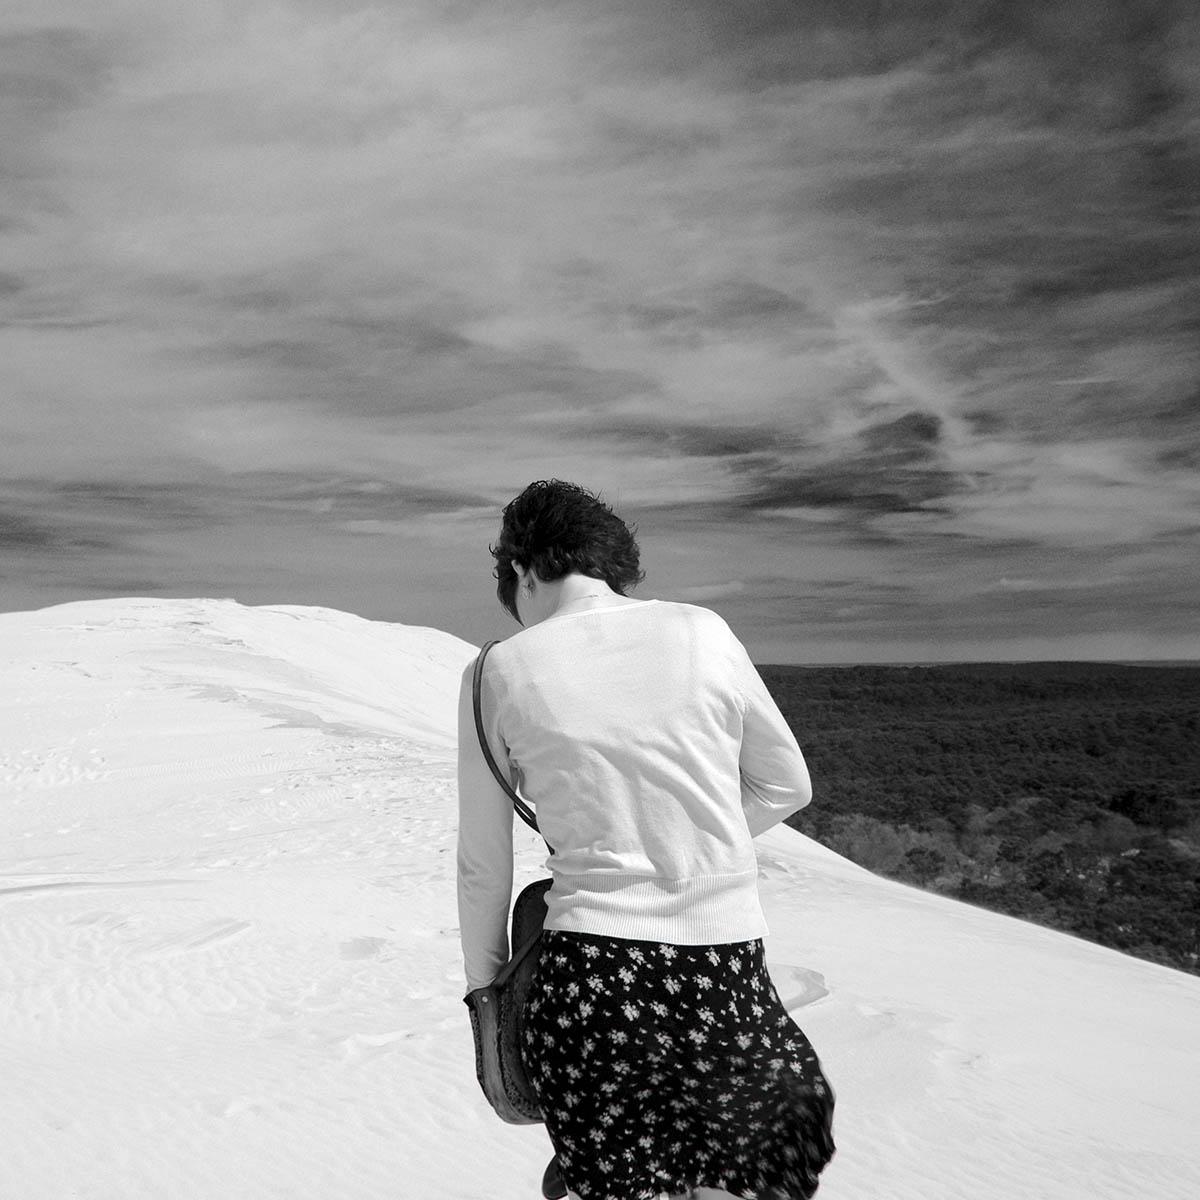 Dune du Pyla, France, 2014